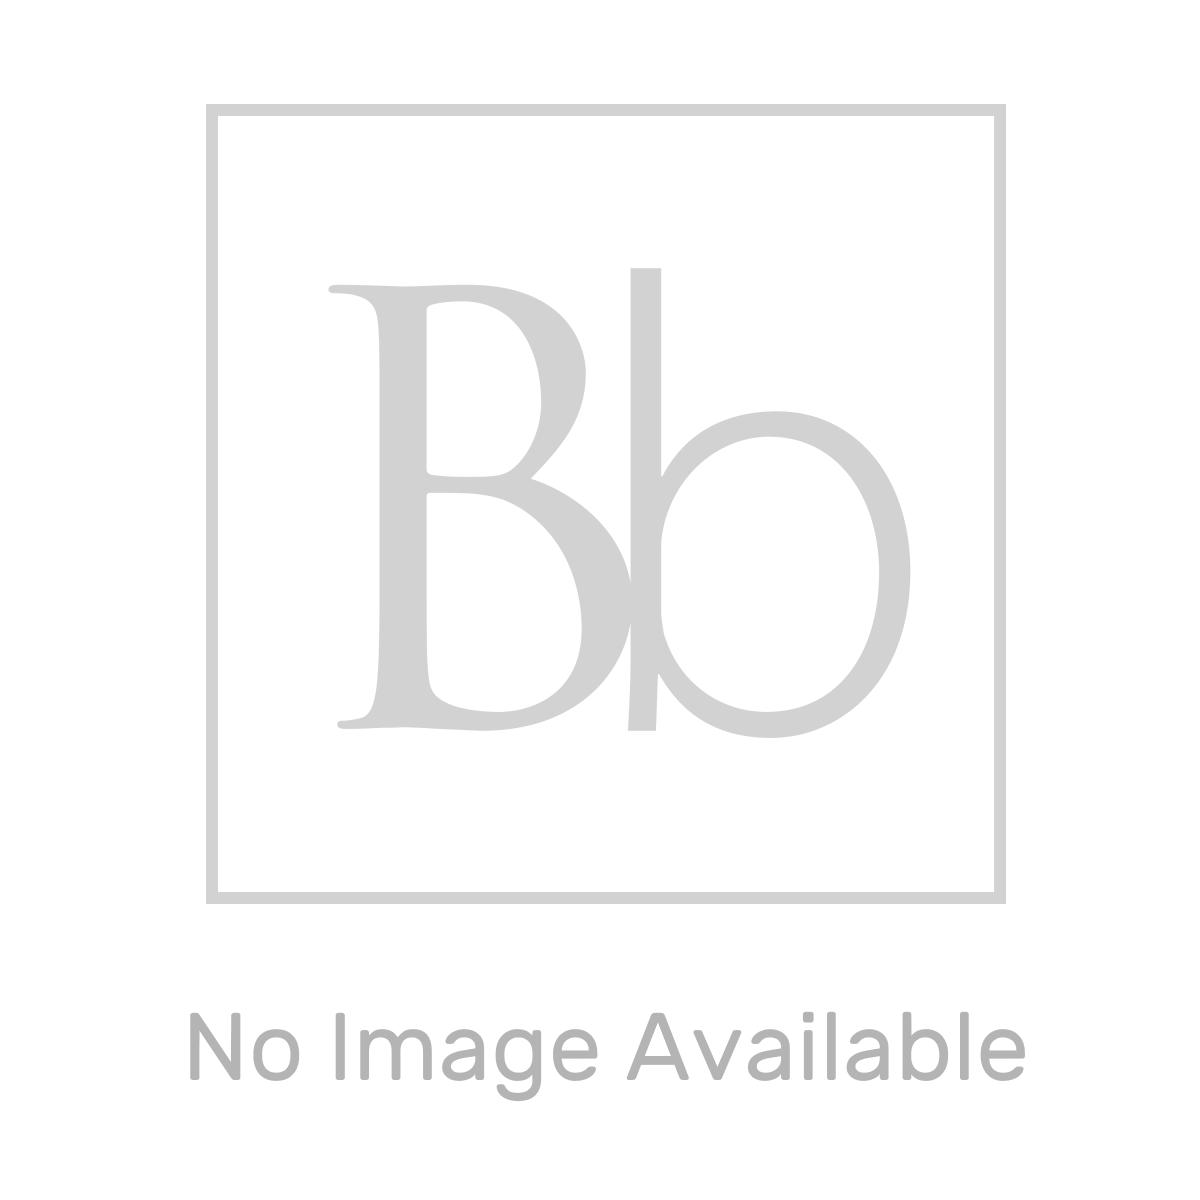 April Offset Quadrant Anti Slip Shower Tray 900 x 760 Left Hand Line Drawing